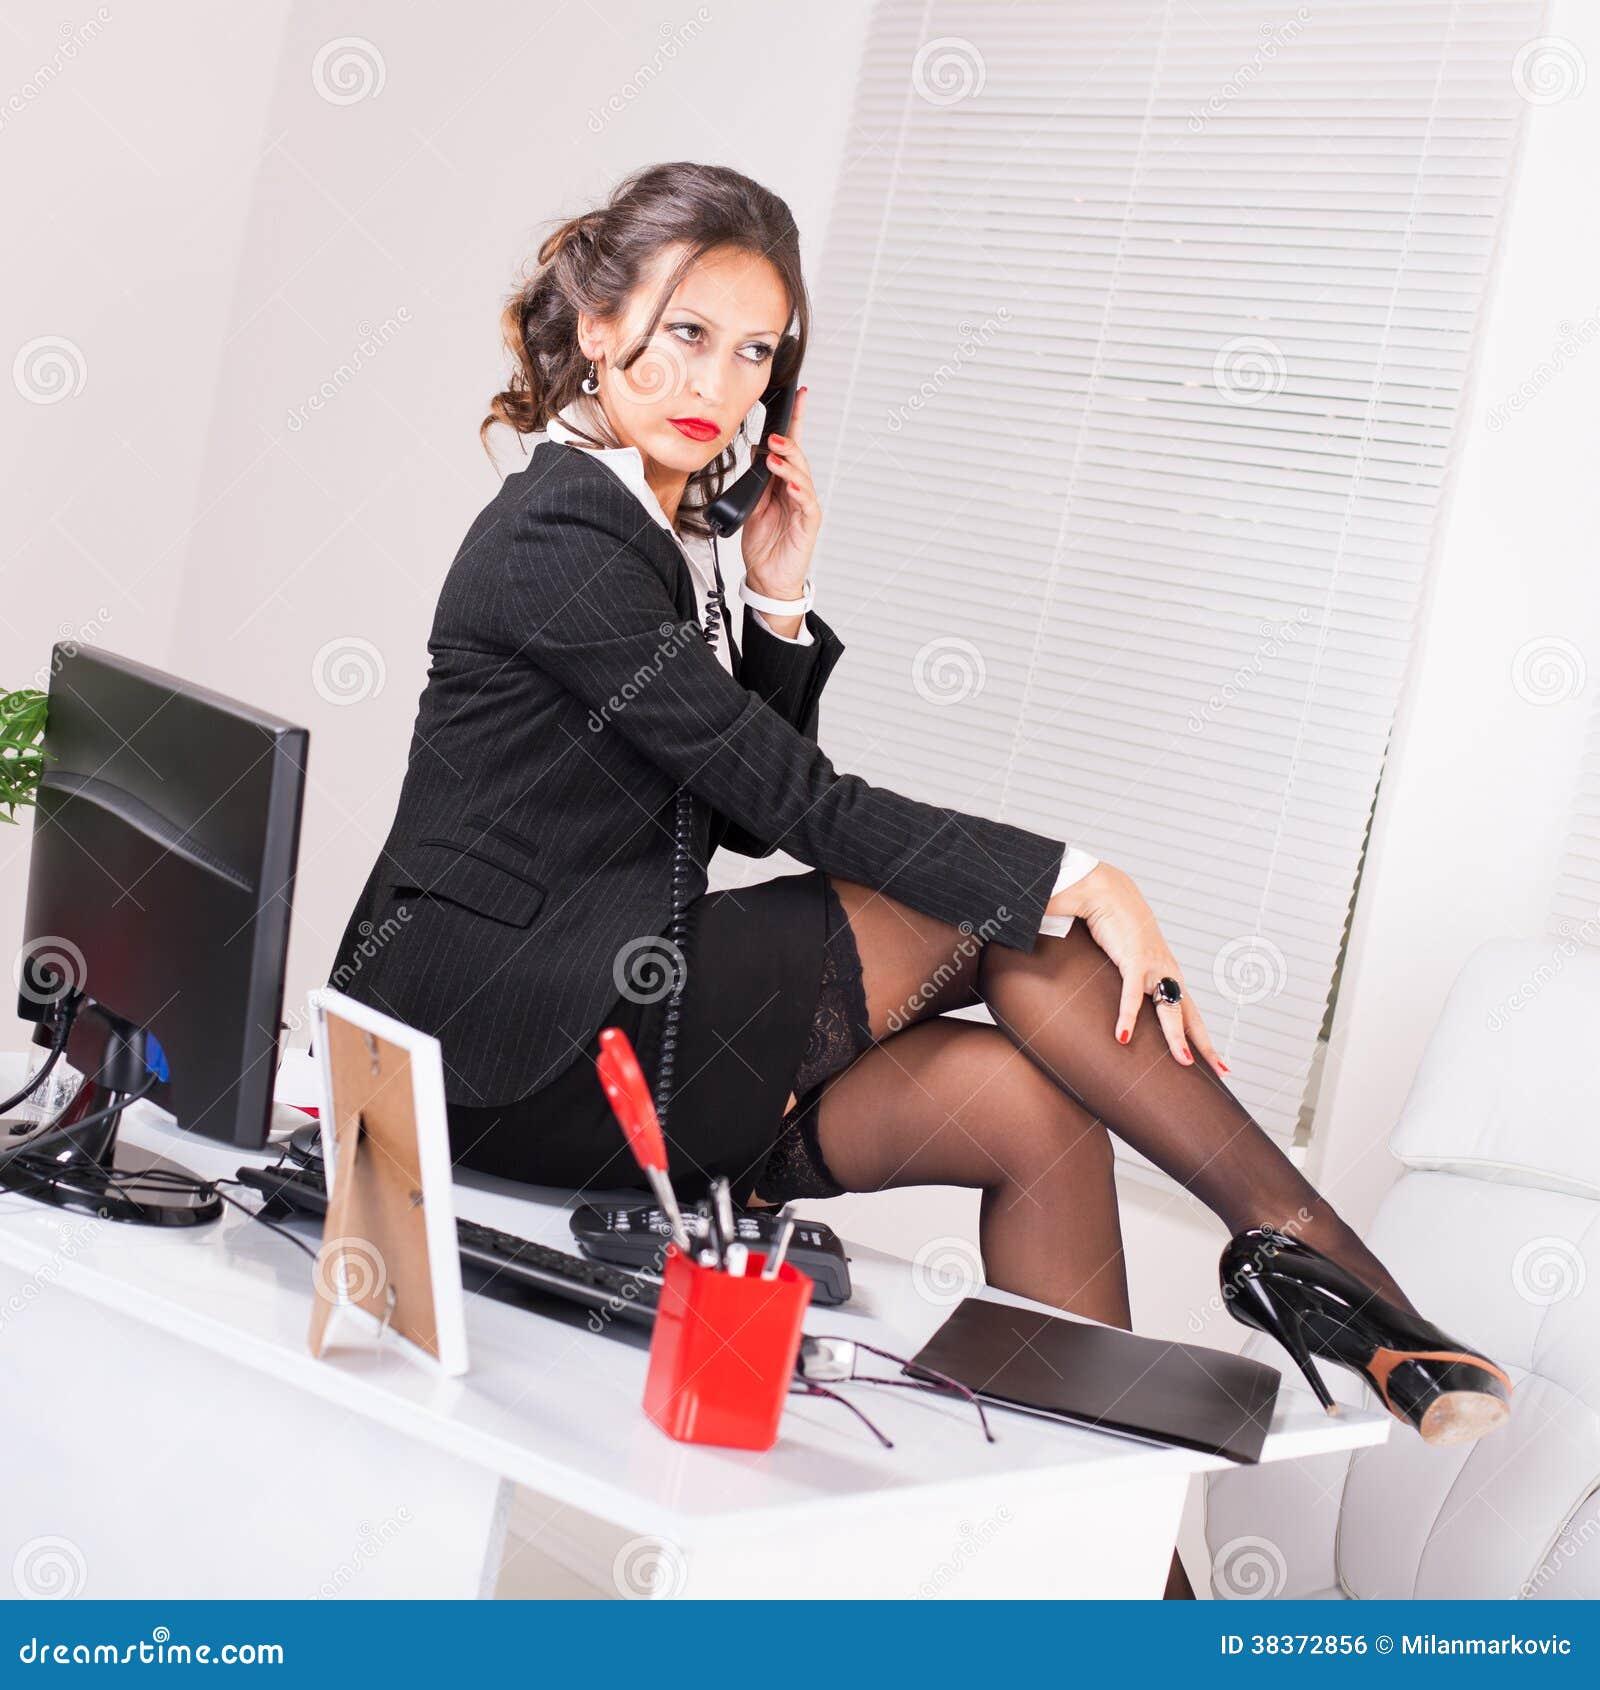 sekretar-v-ofis-s-intimom